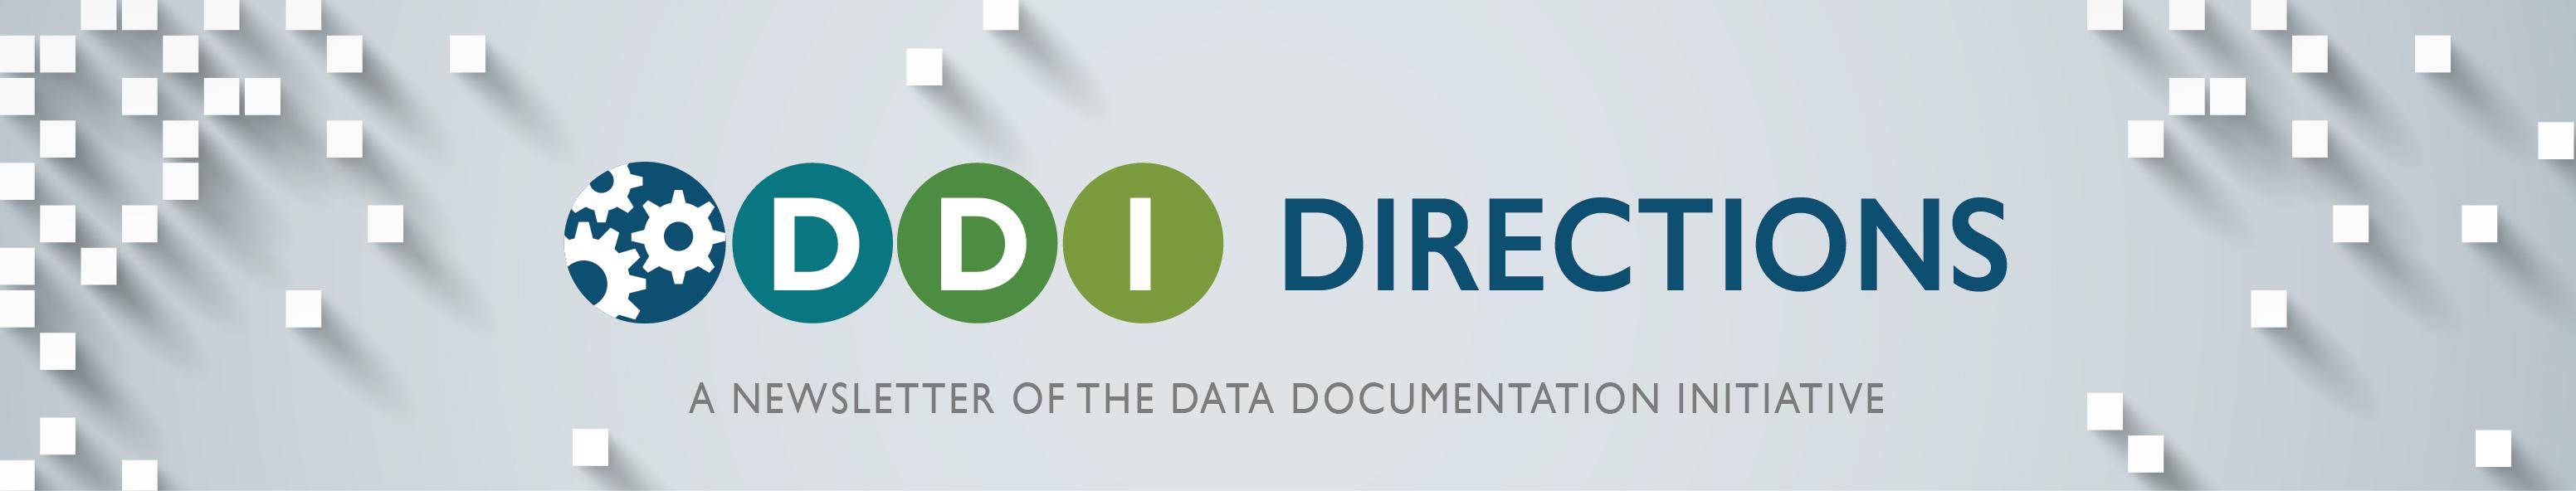 DDI DIRECTIONS: Logo of the DDI Alliance's Newsletter